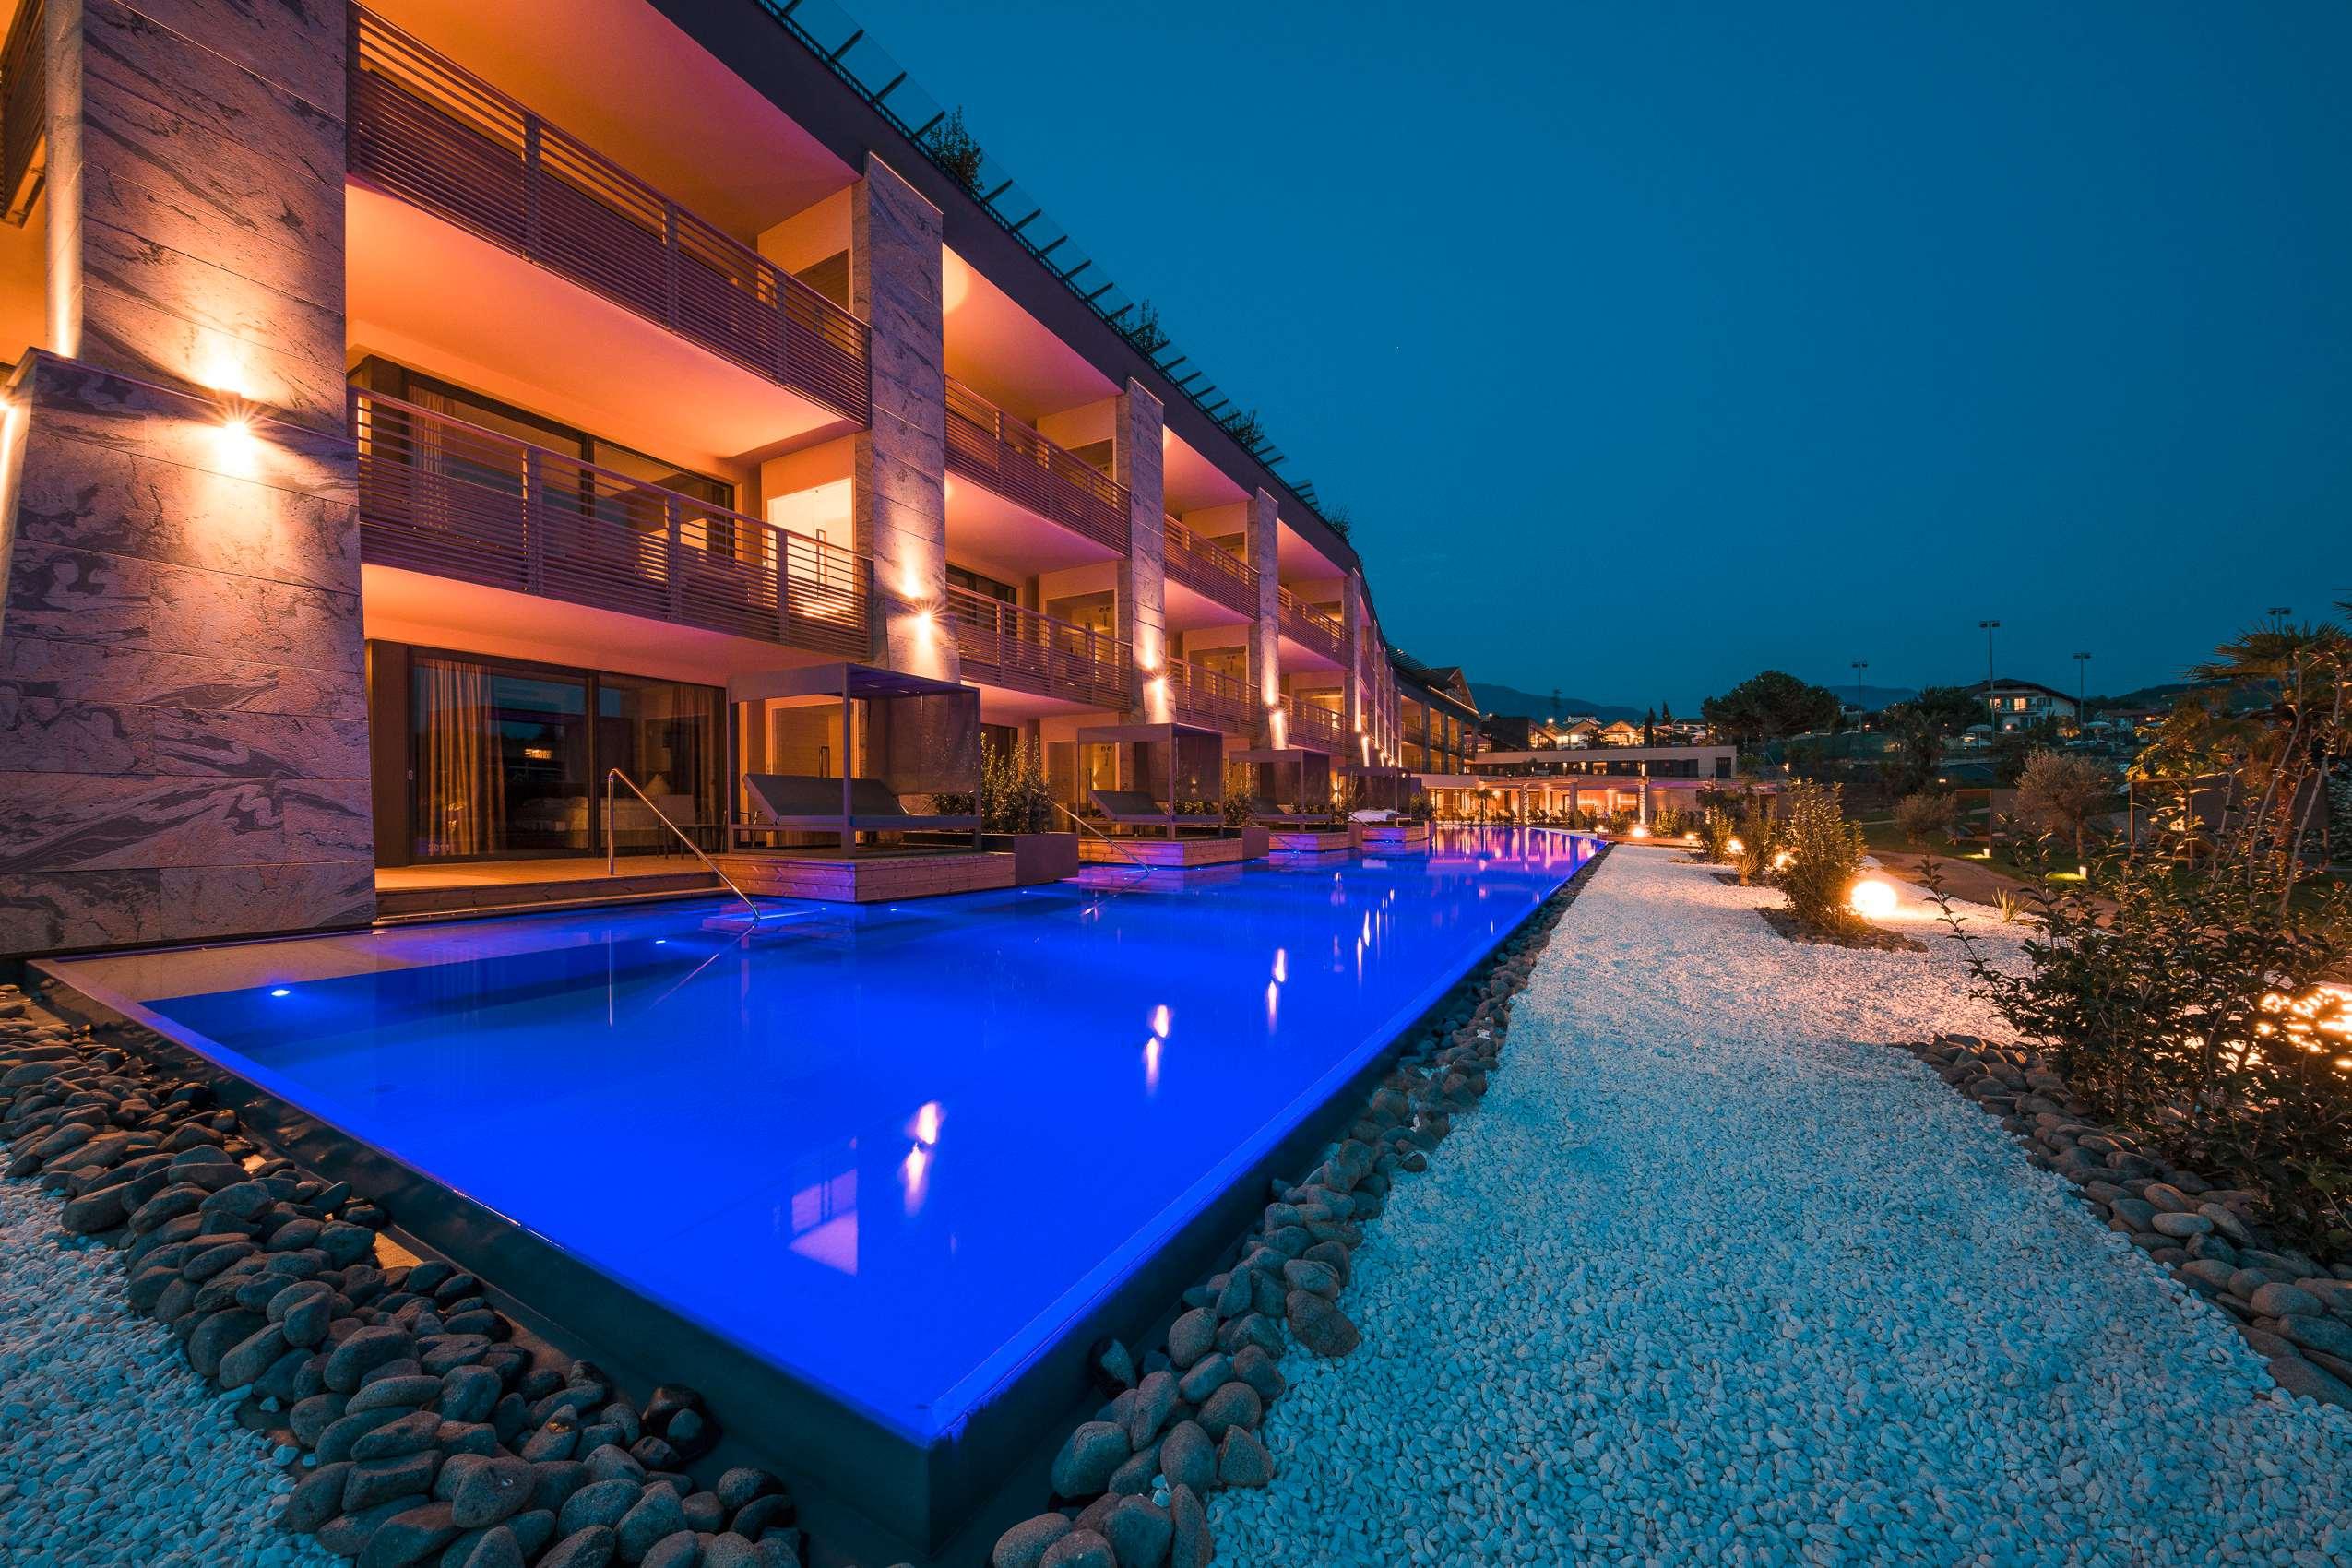 Beleuchteter Suitenpool im Hotel Weinegg